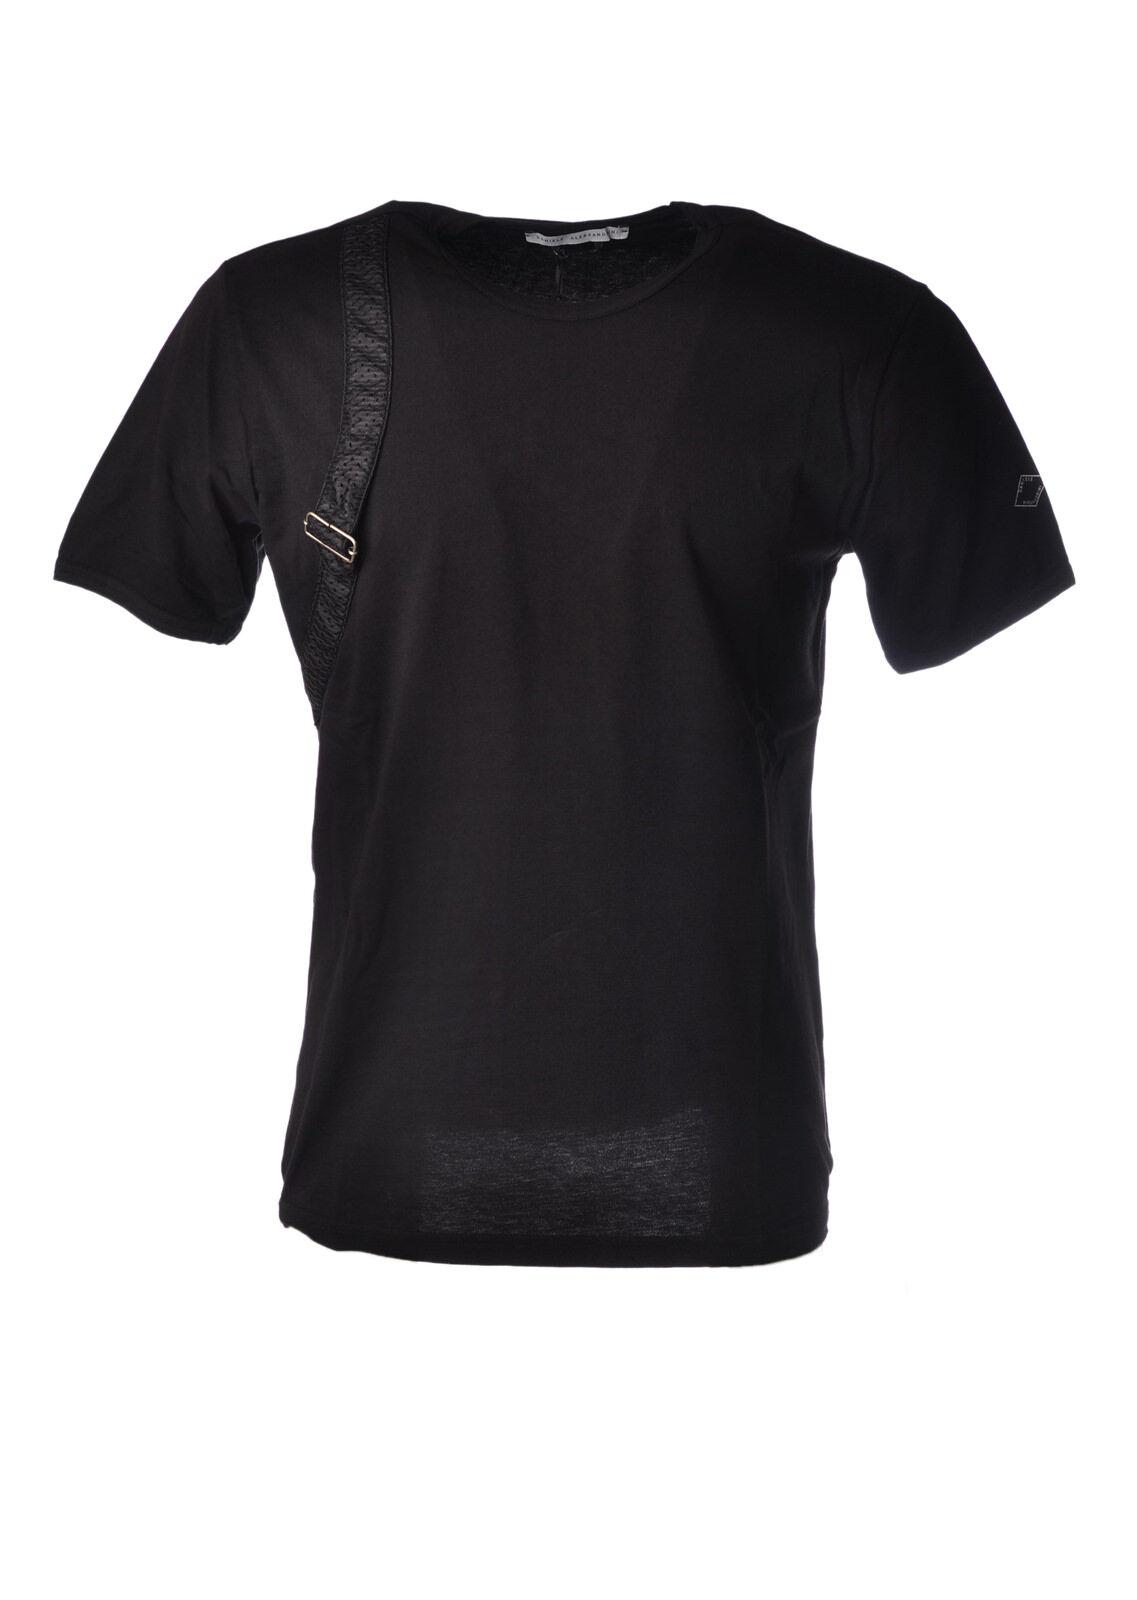 Daniele Alessandrini - Topwear-T-shirts -  Herren - Nero - 5045210H184506